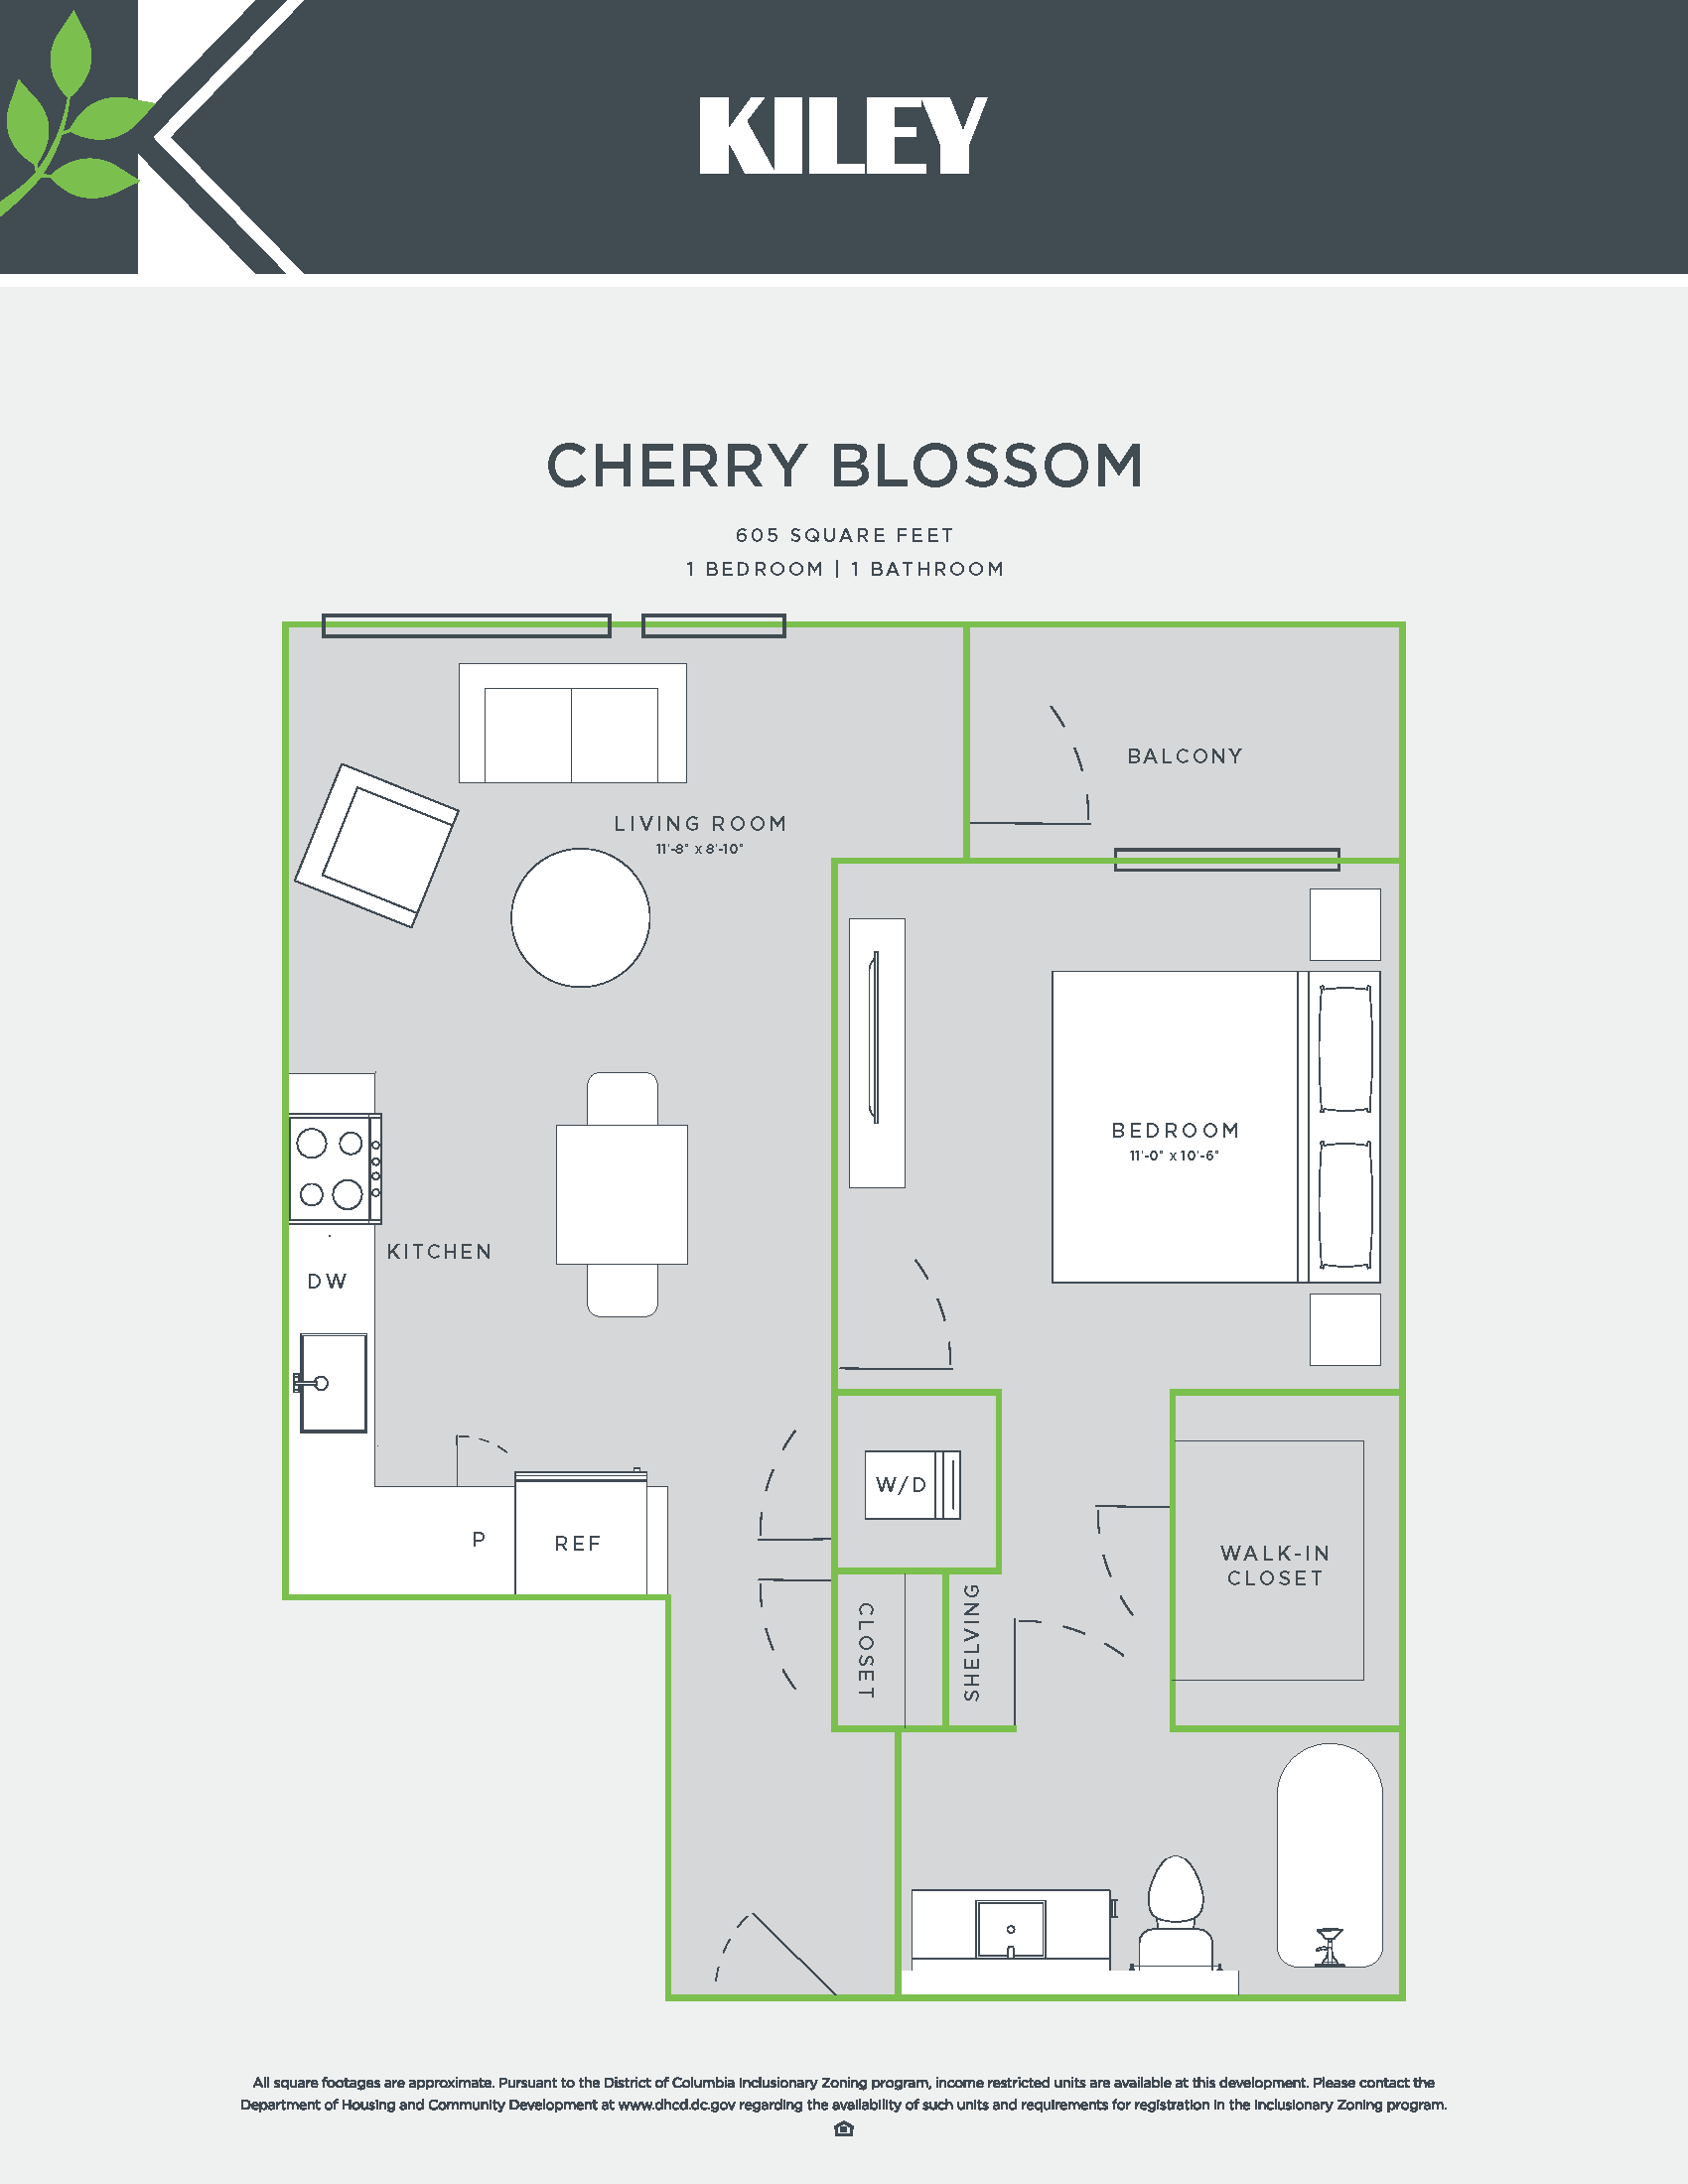 Cherry Blossom (1 bed /1 bath) Floor Plan